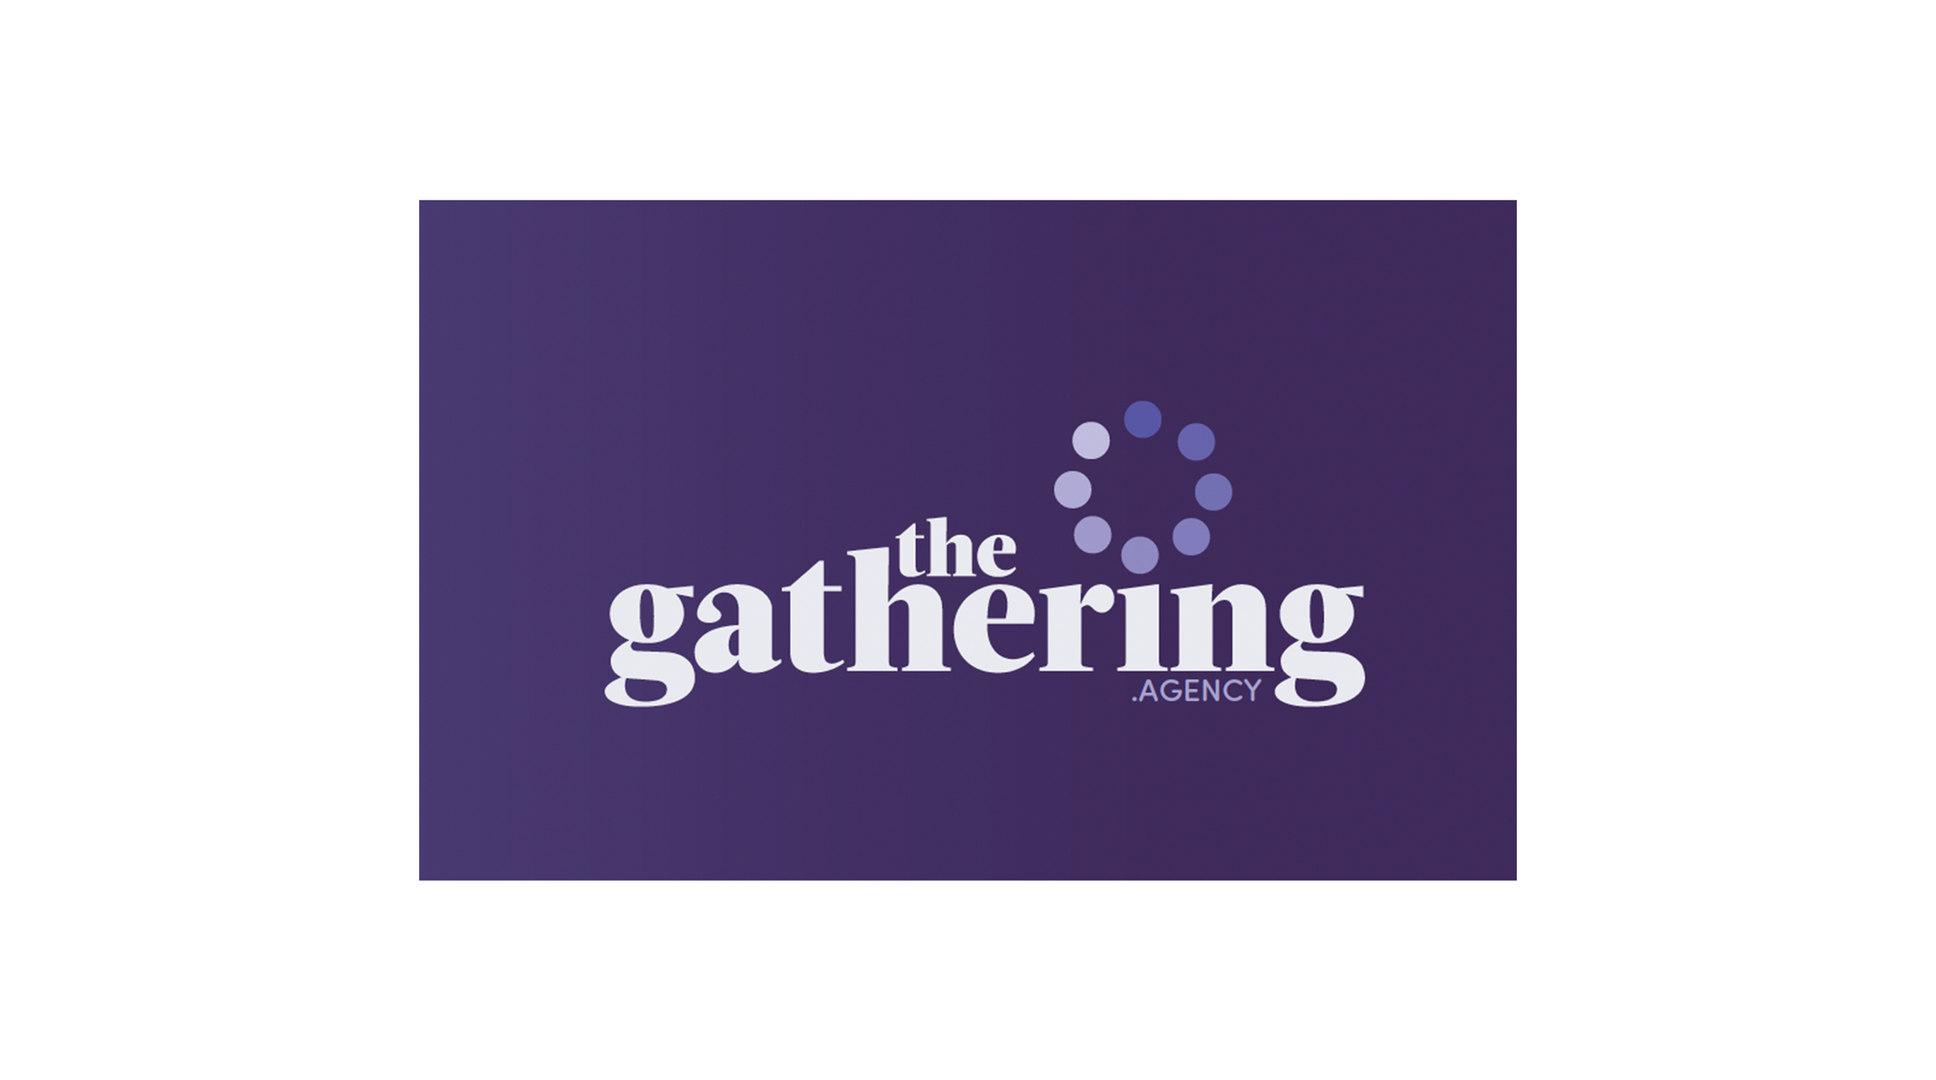 TGD_Gathering.jpg